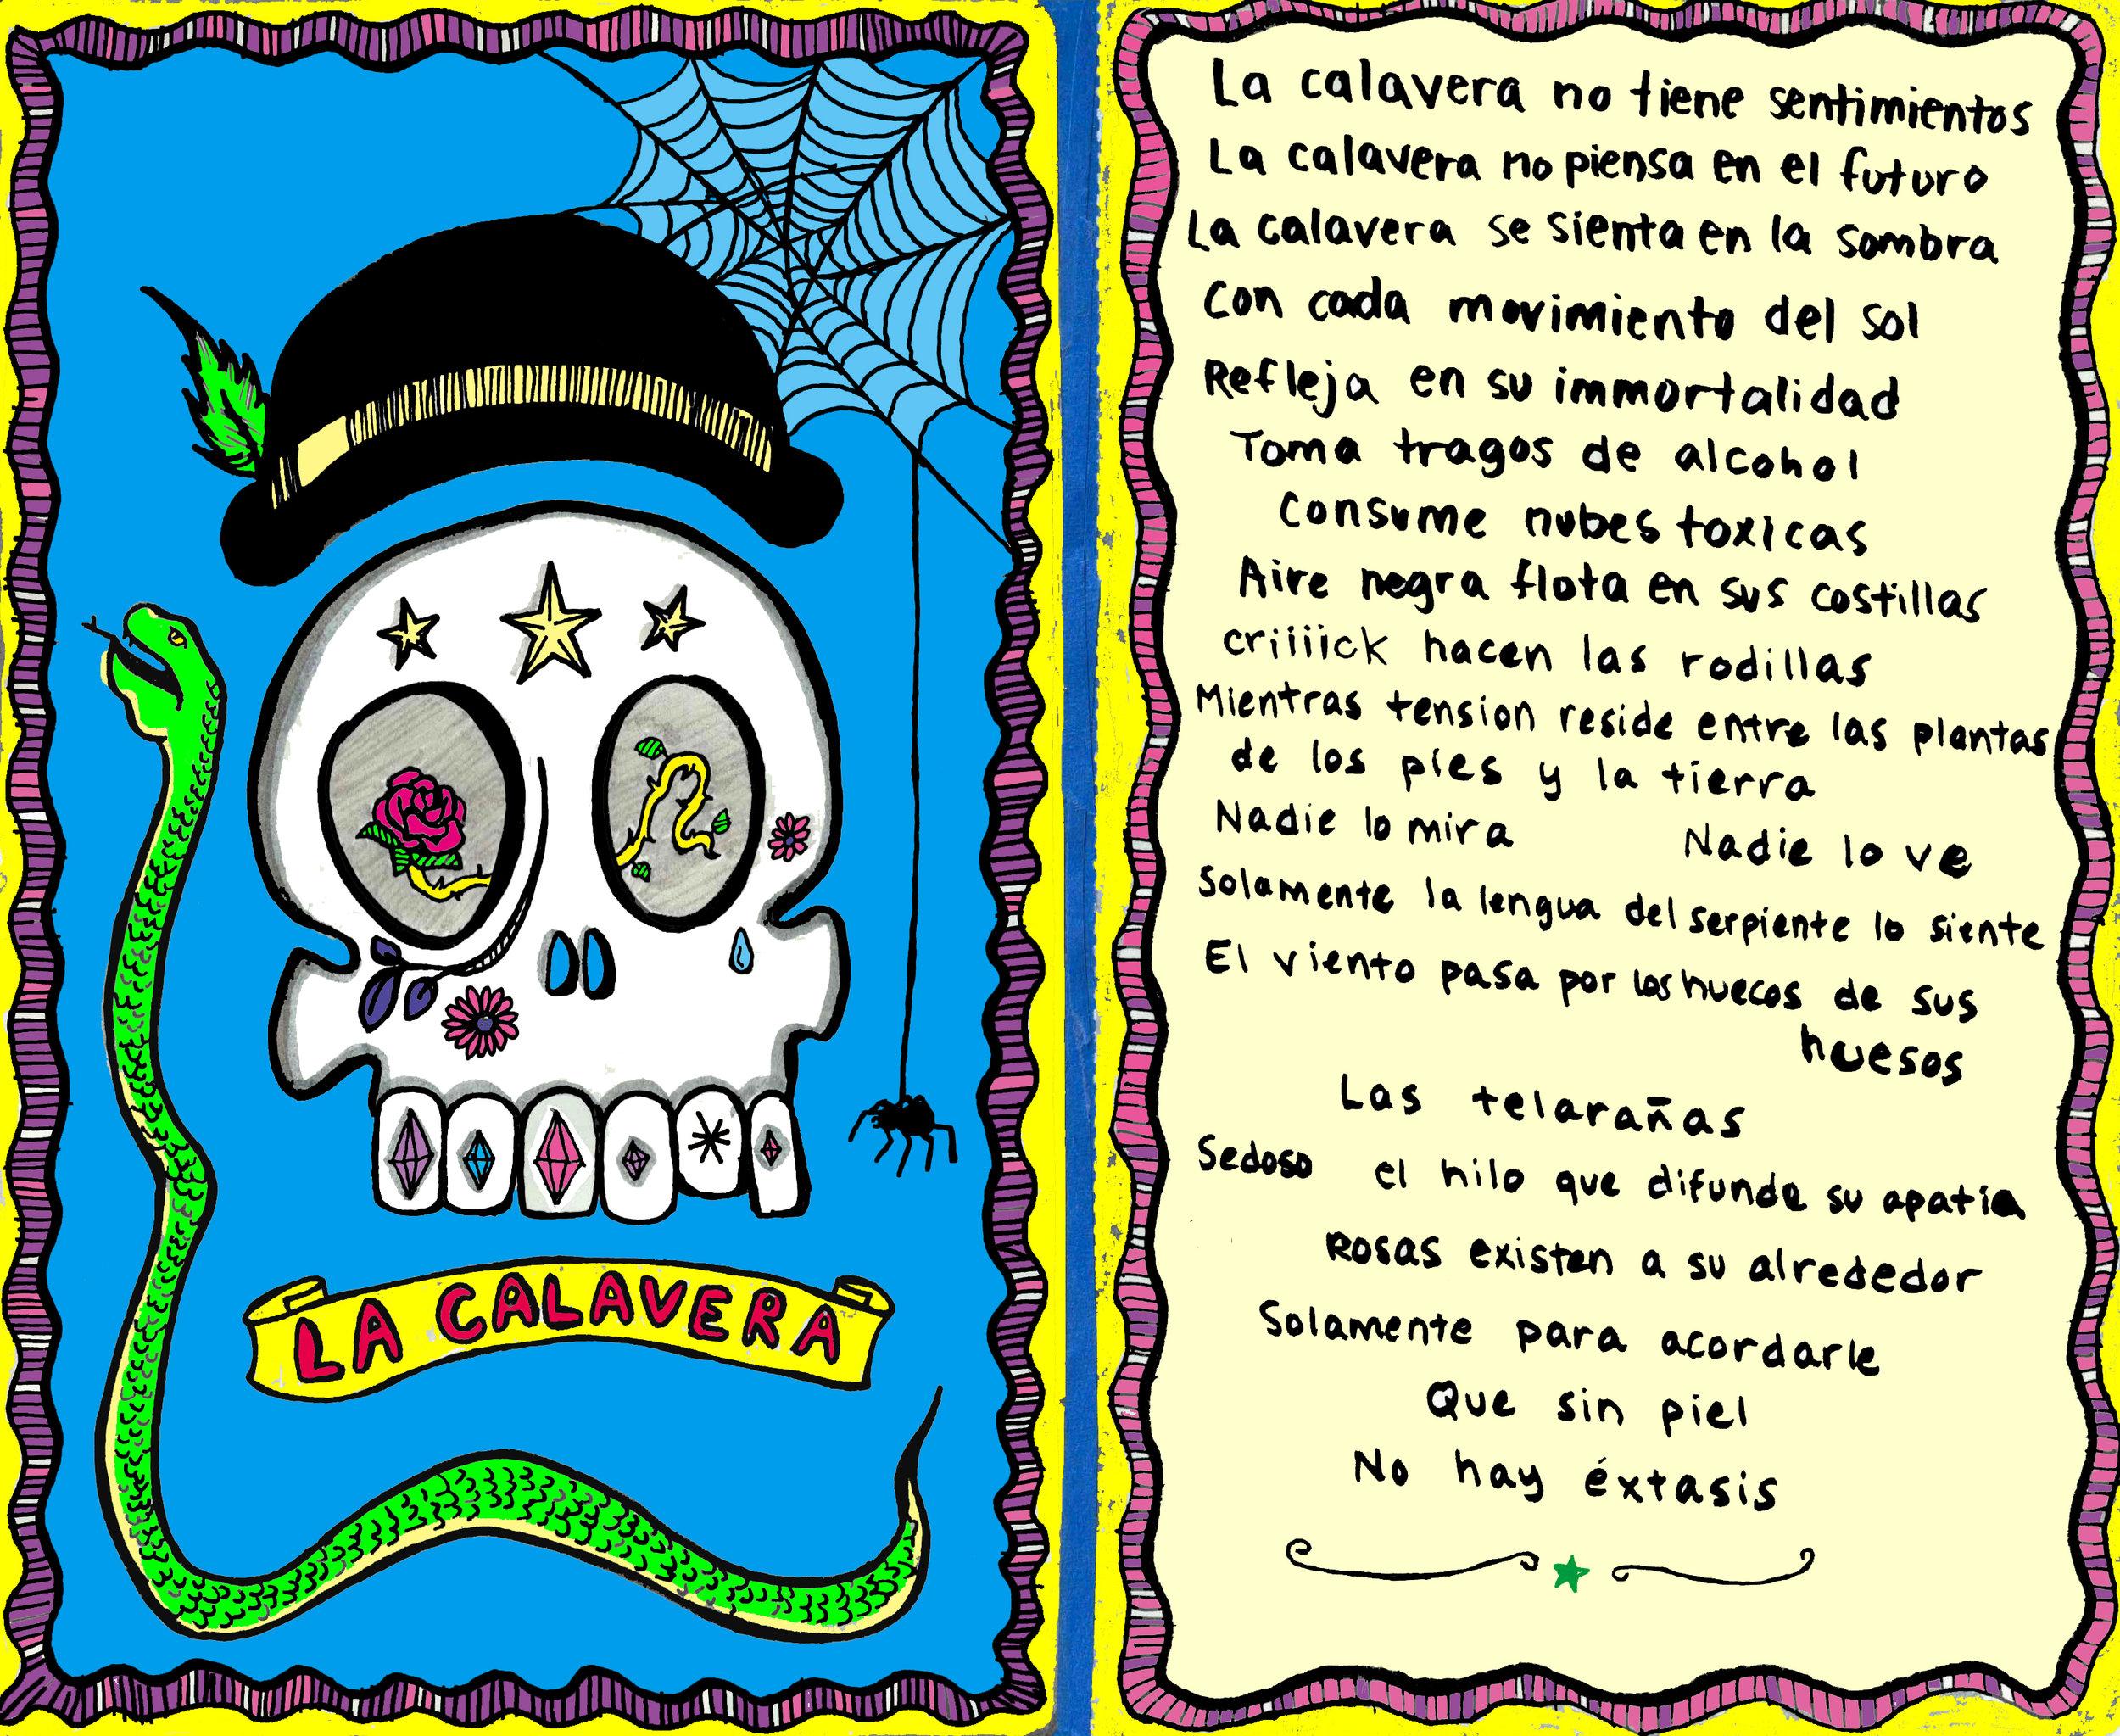 LaCalavera.jpg